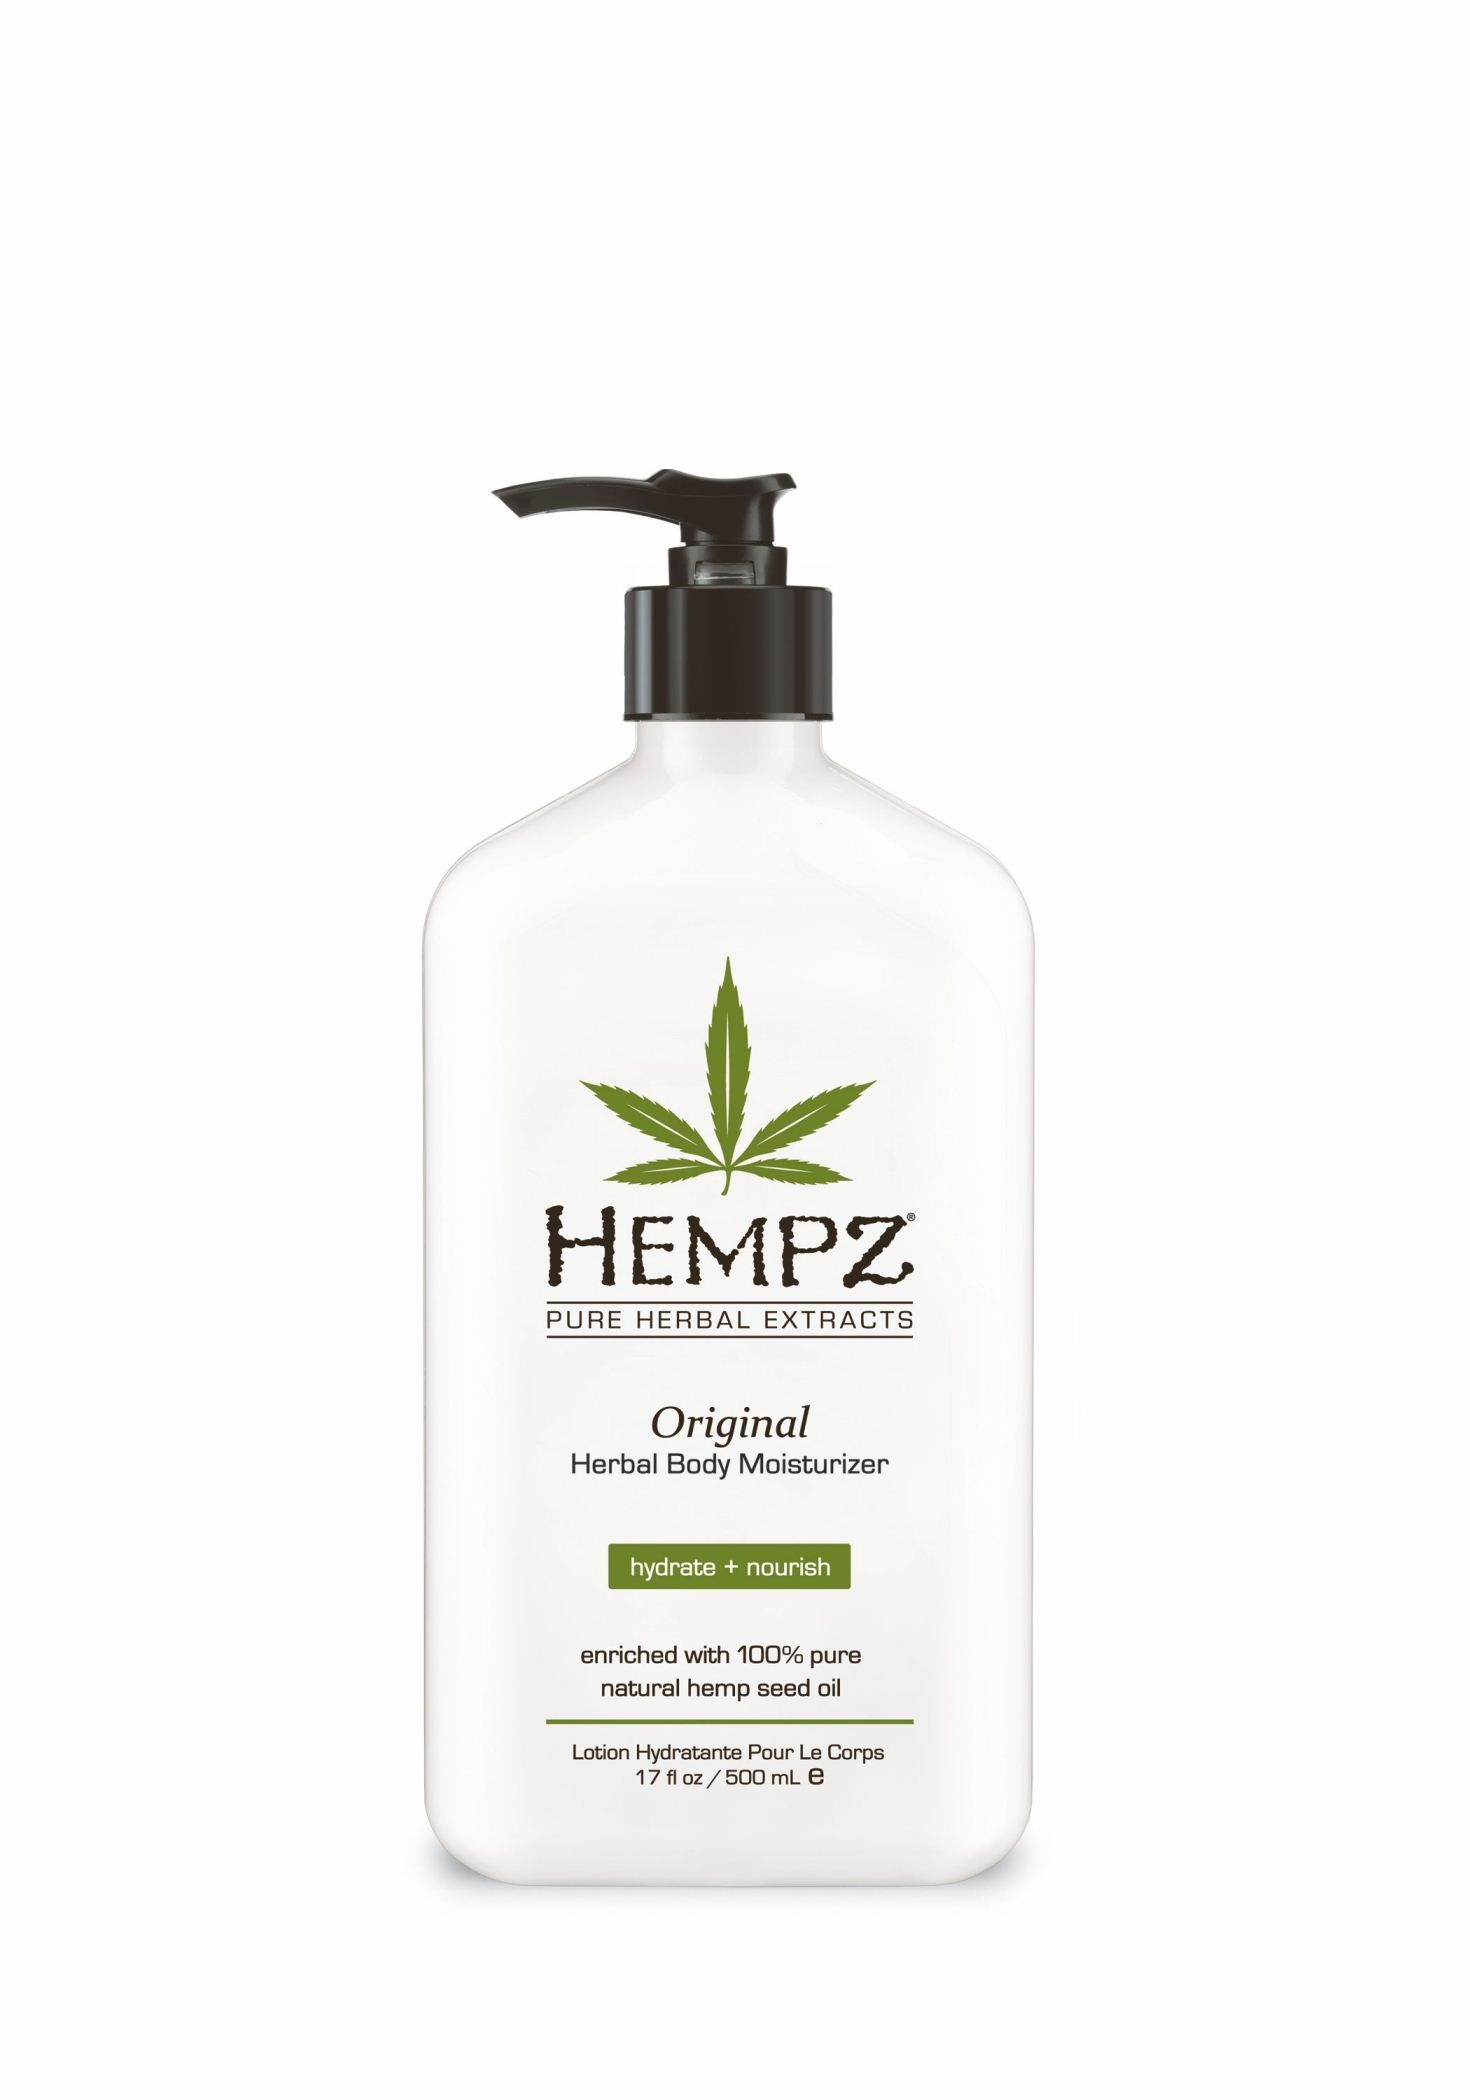 Hempz Original Herbal Moisturizer 17oz/500ml